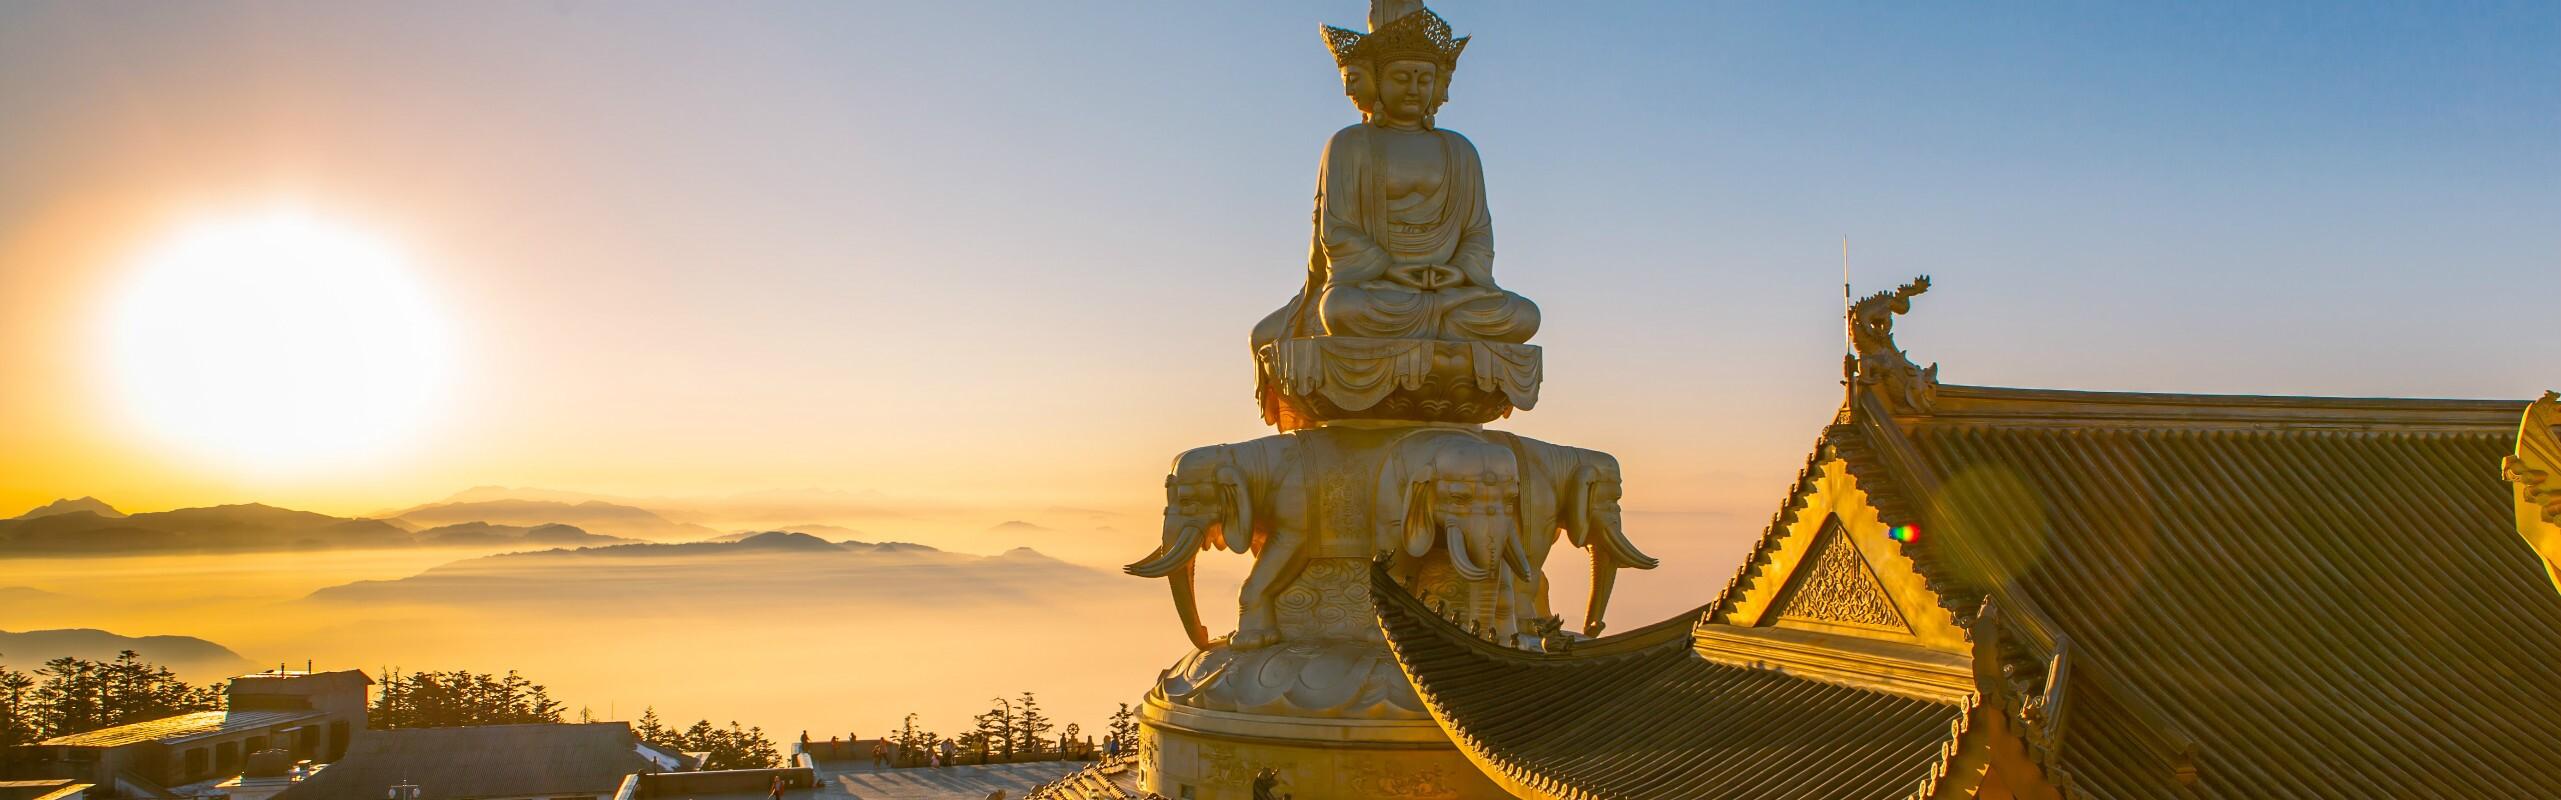 5-Day Chengdu, Leshan and Mount. Emei Tour